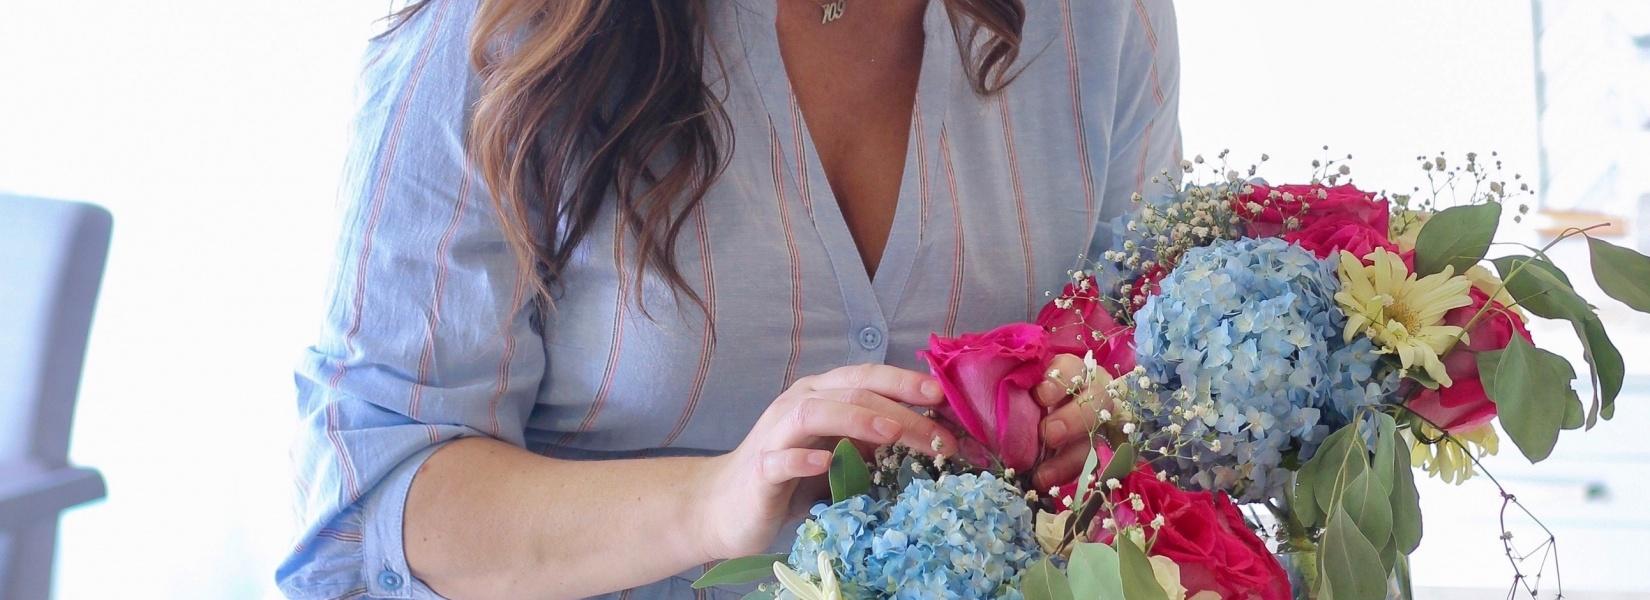 Baby in Bloom   DIY Gender Reveal Floral Arrangements